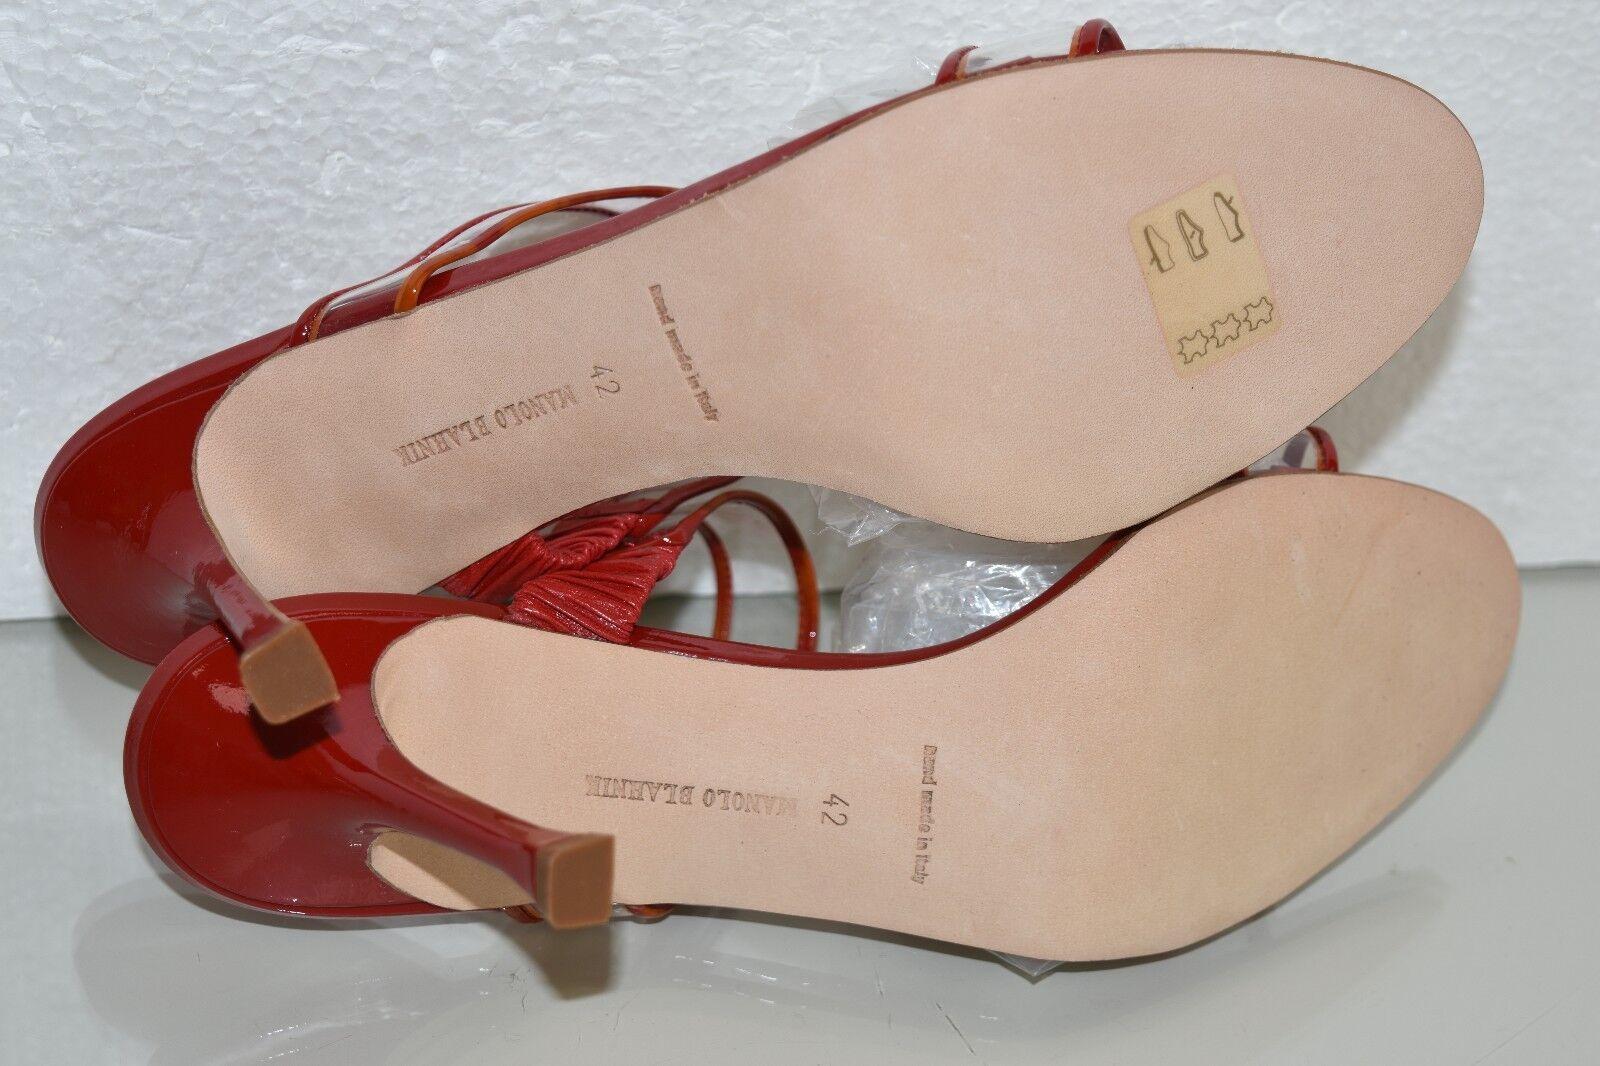 Neuf Manolo Blahnik Blahnik Blahnik Muluca PVC Sandales Verni Rouge Glissière Chaussures 37.5 98ed05